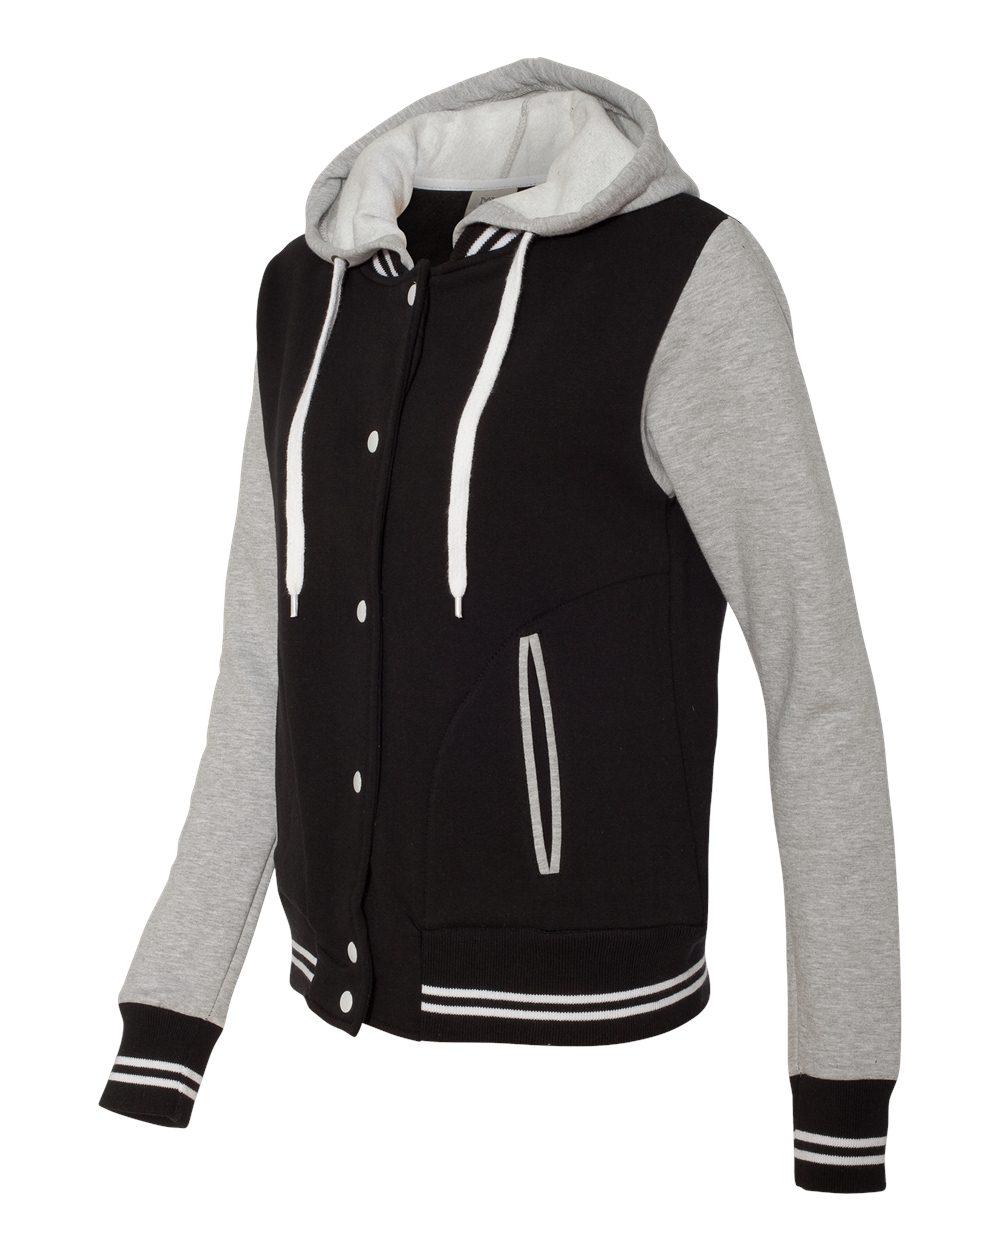 MV Sport Ladies' Varsity Sweatshirt - W2344